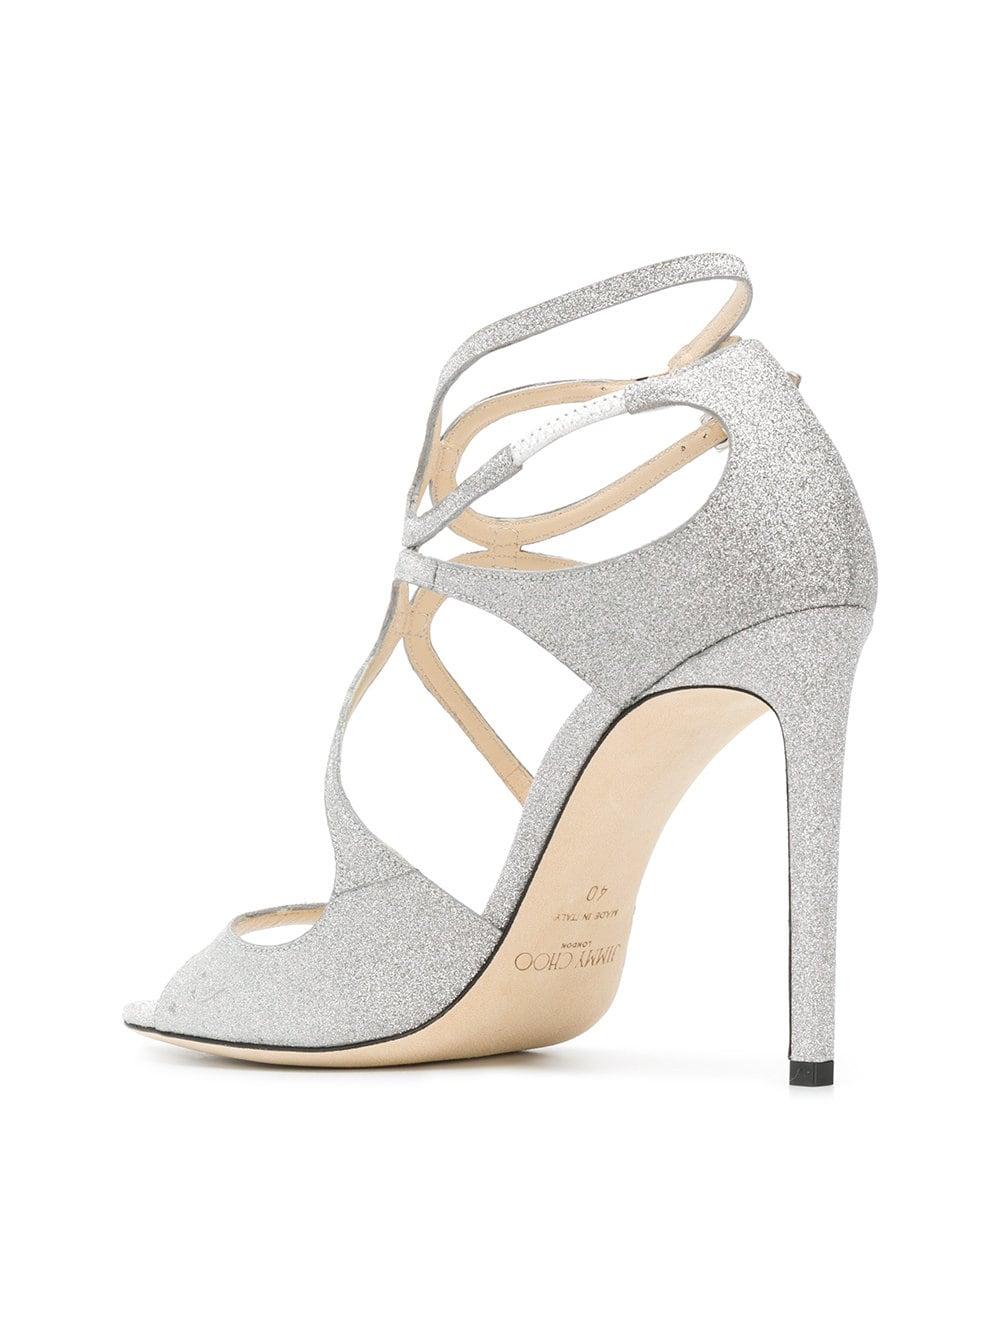 1a6988596600 Silver Glitter LANG Sandals - JIMMY CHOO - Russocapri